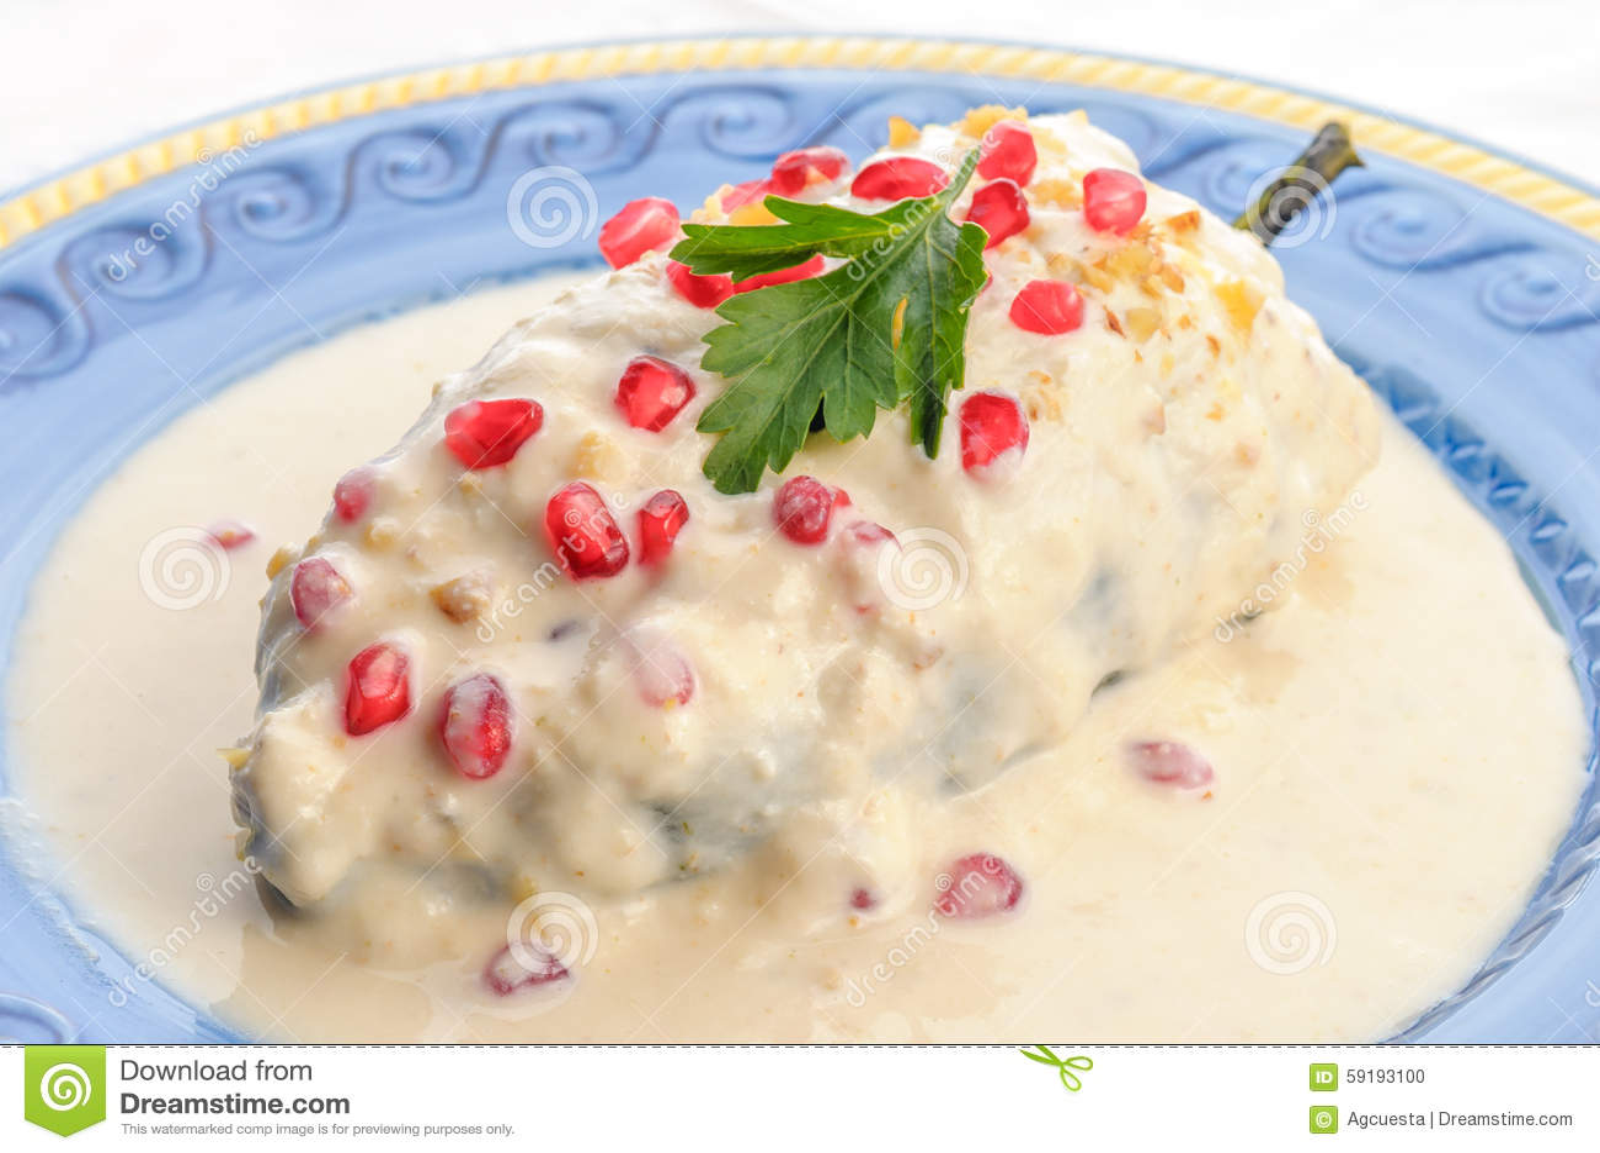 Chiles en nogada mexican food stock photo image 59193100 for Cuisine en image